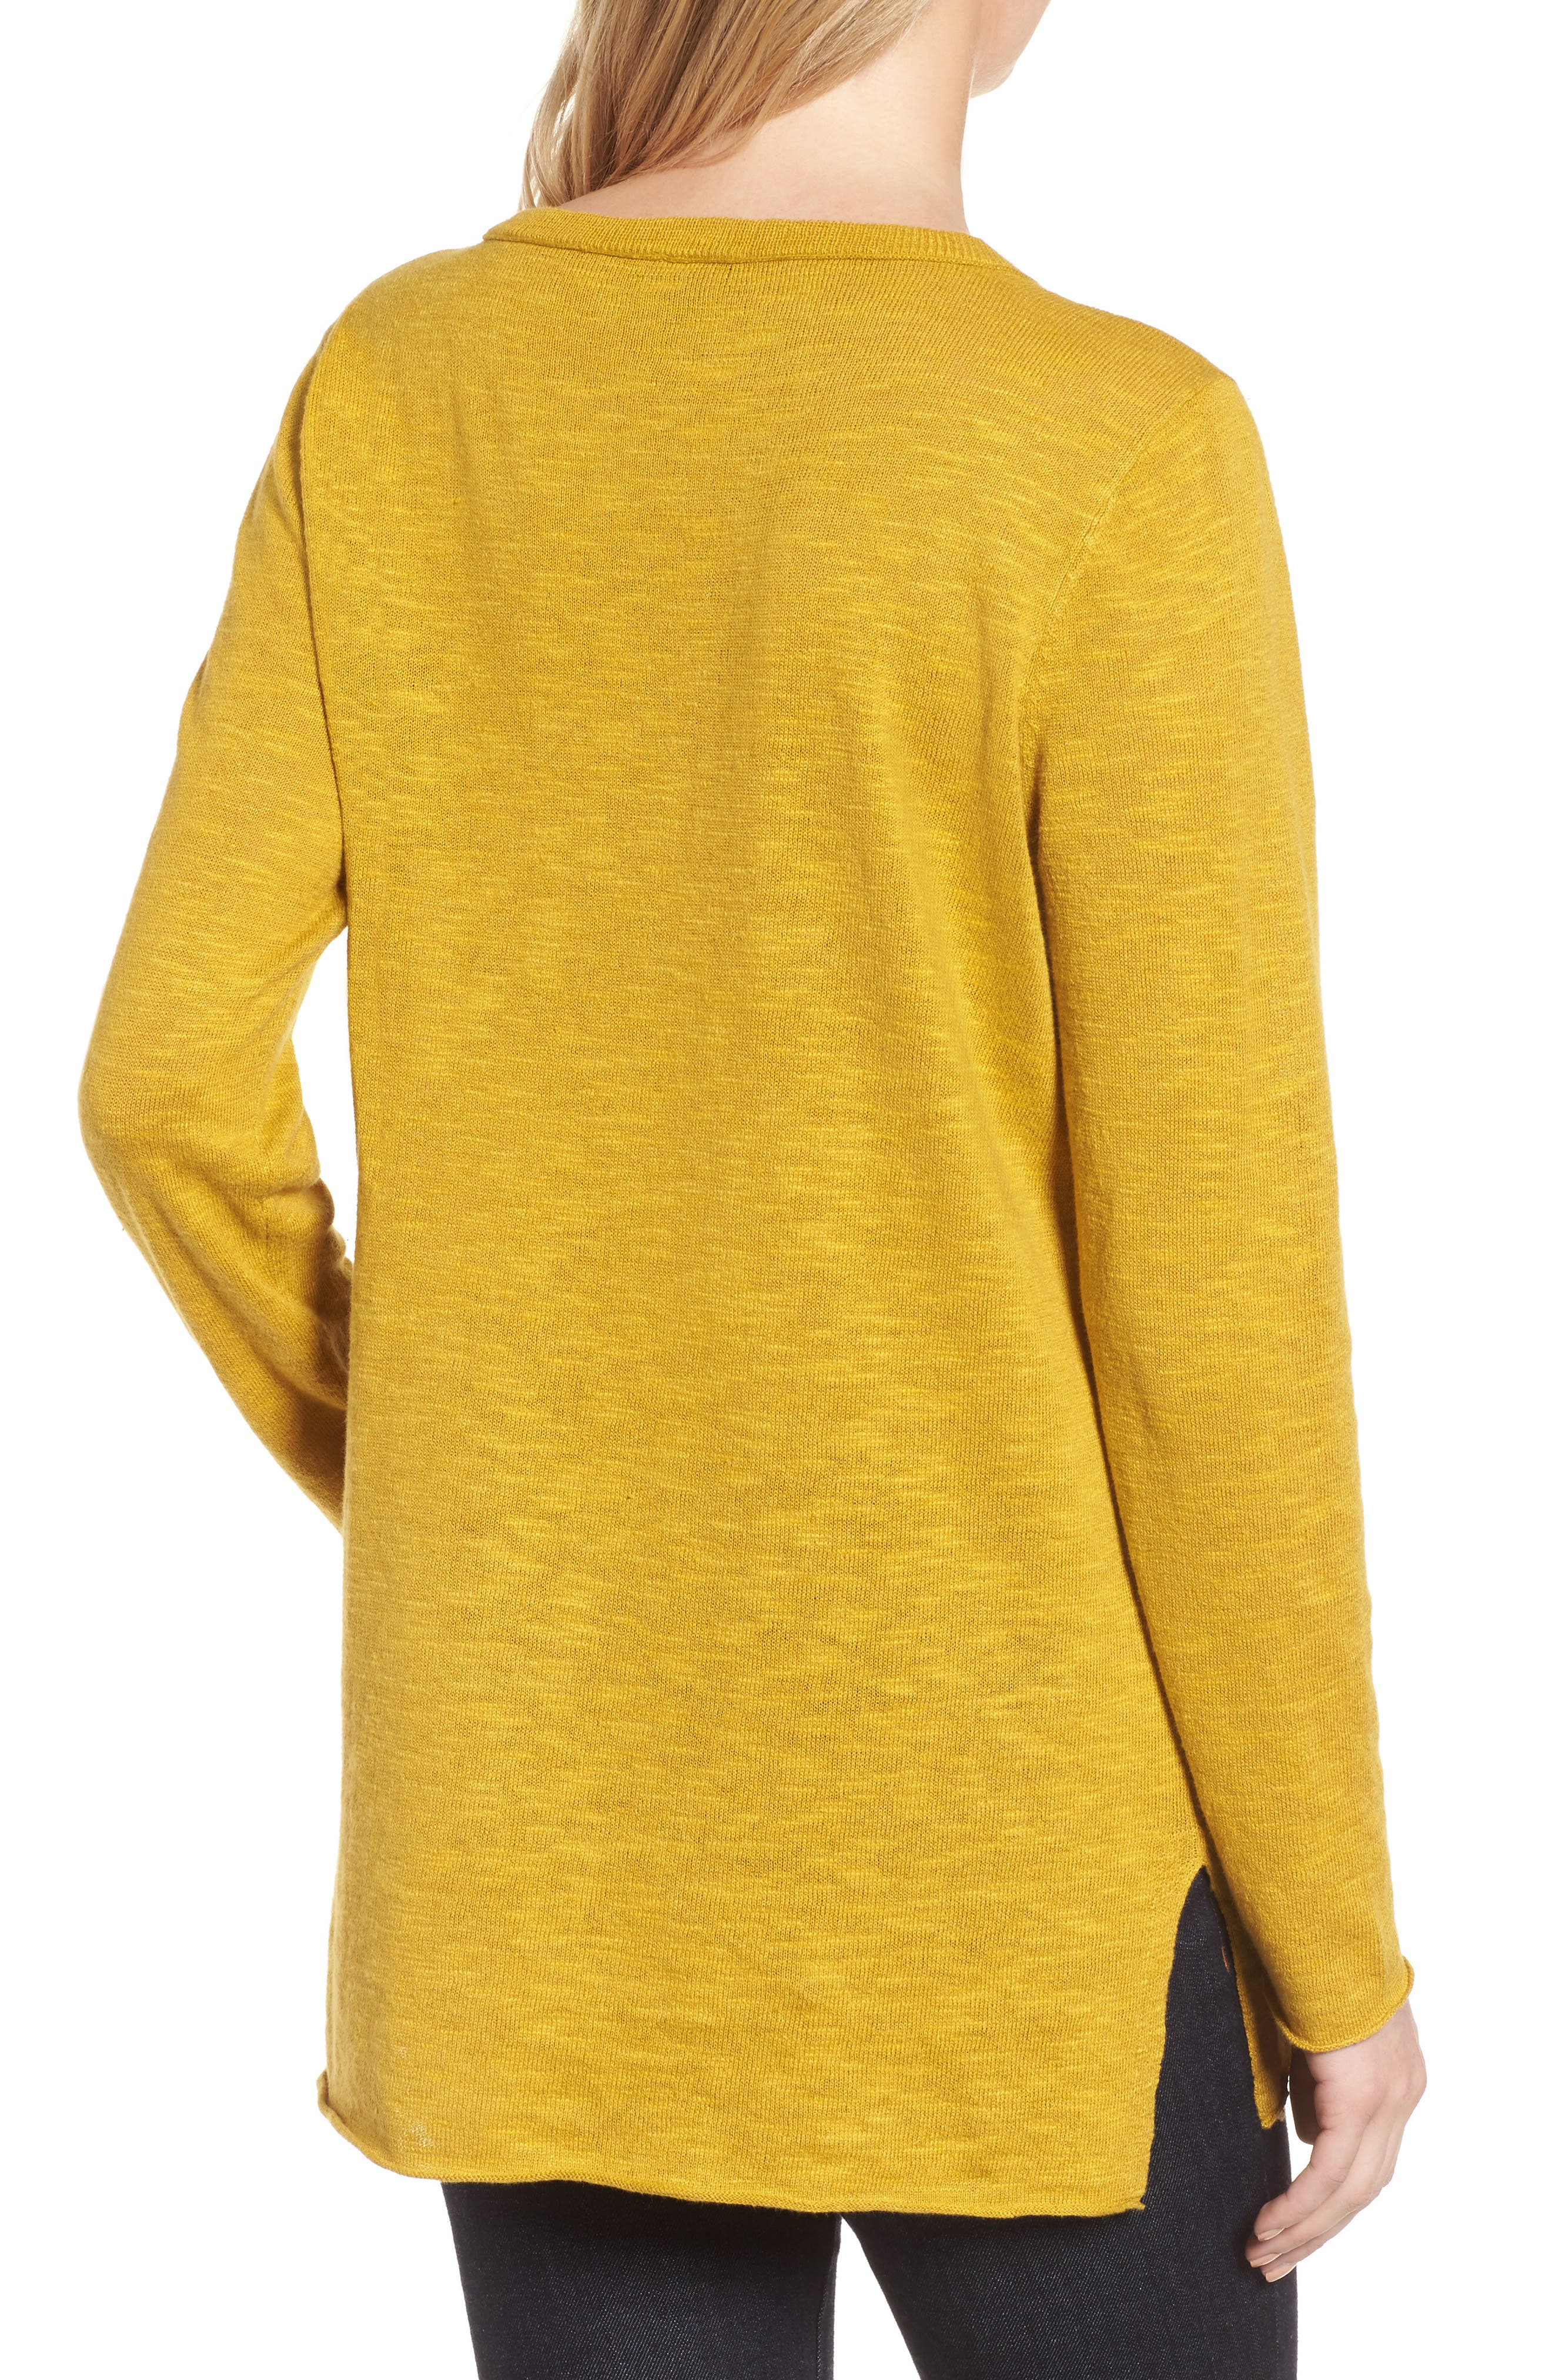 Organic Knit Crewneck Tunic Top,                             Alternate thumbnail 2, color,                             750